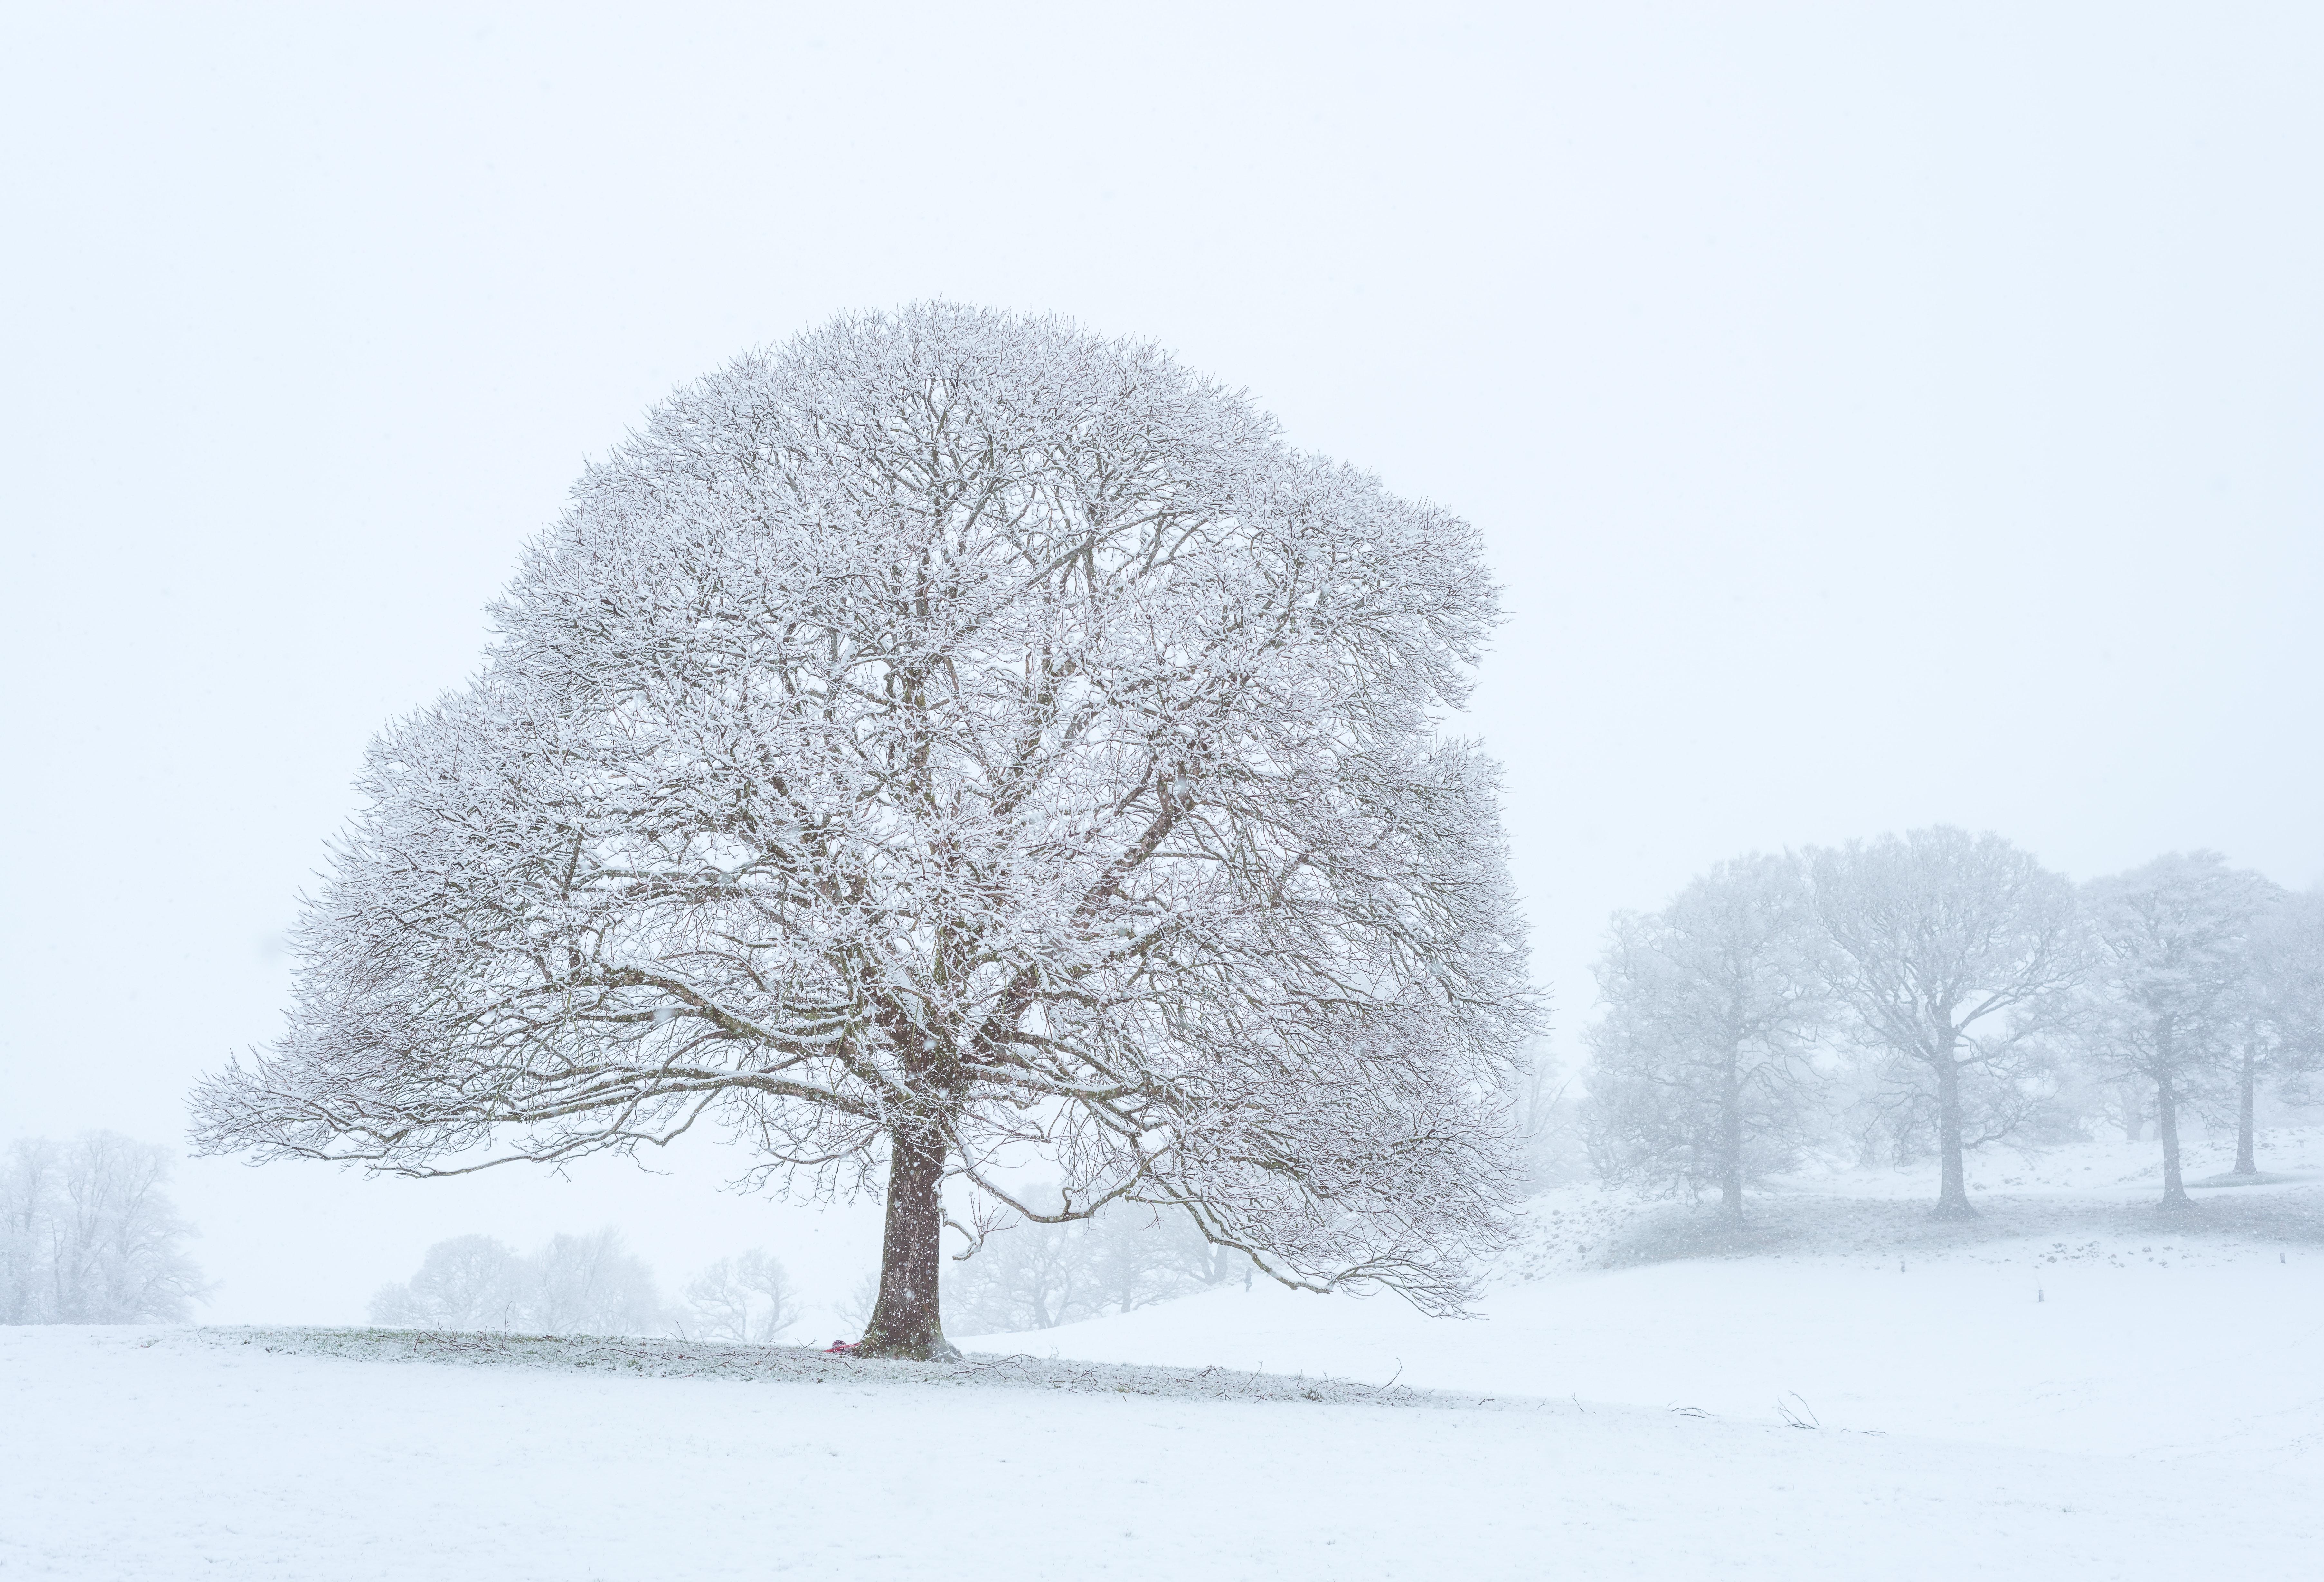 white and brown tree illustation